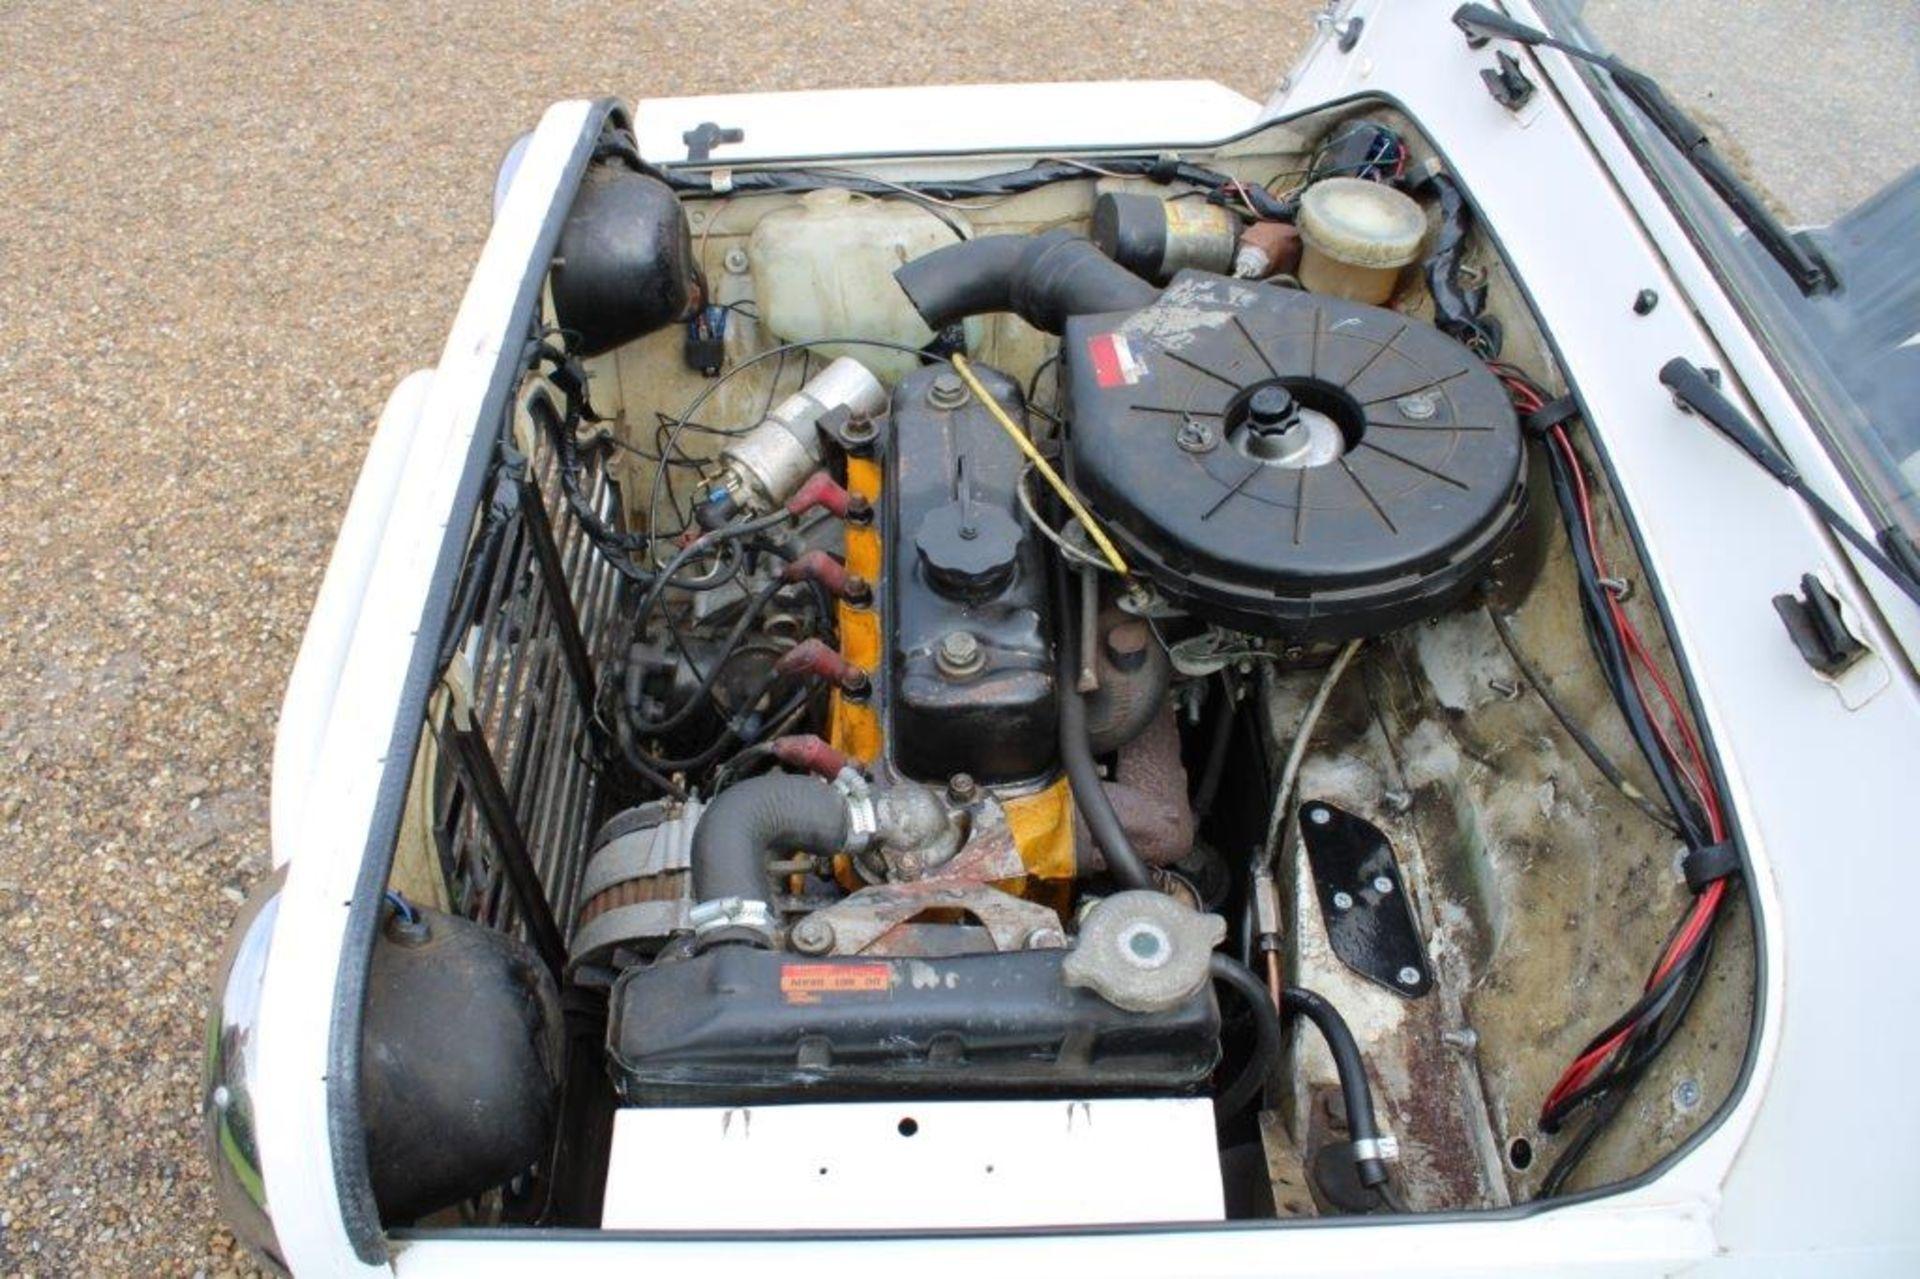 1988 Austin Rover Mini Moke - Image 21 of 22